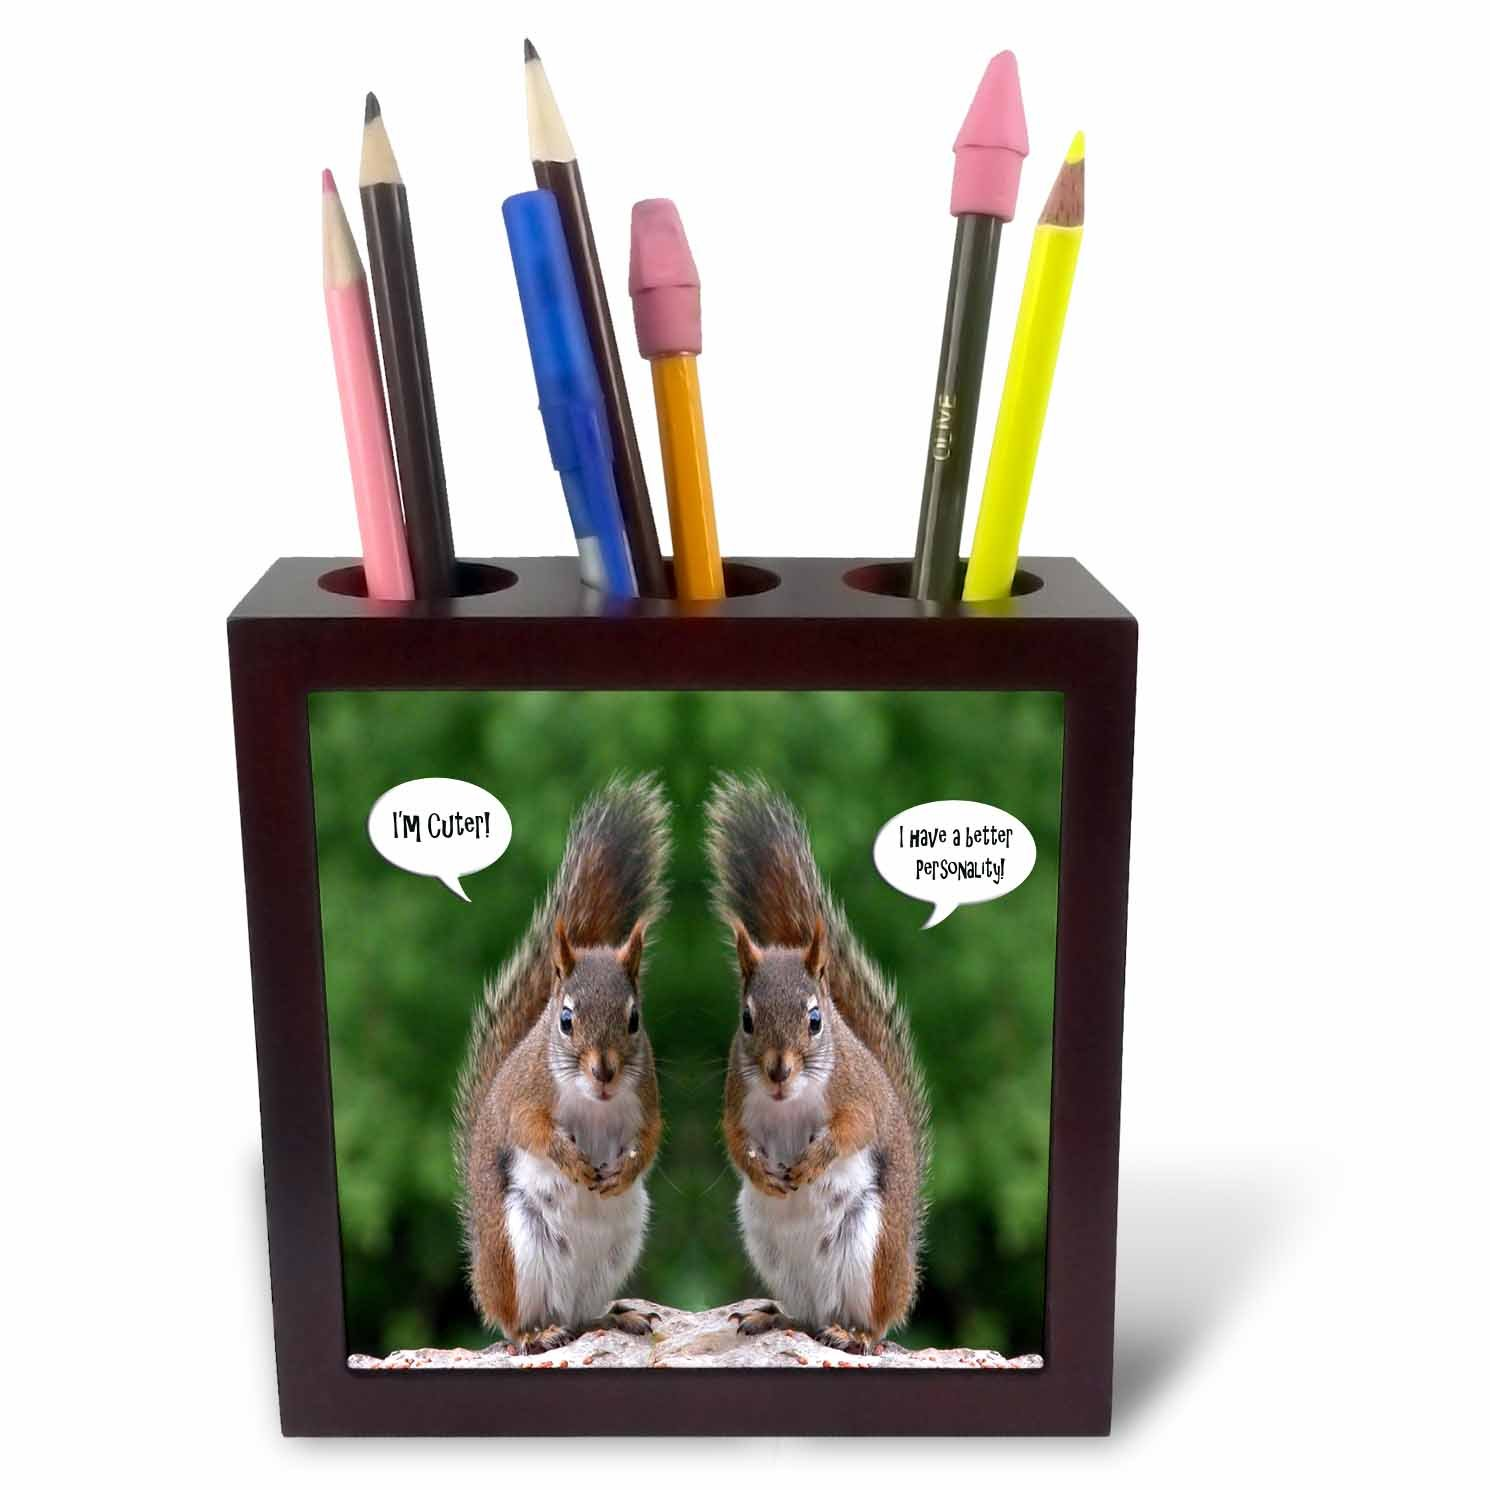 ph/_20799/_1 3dRose Red Squirrel Humor Tile Pen Holder 5 5